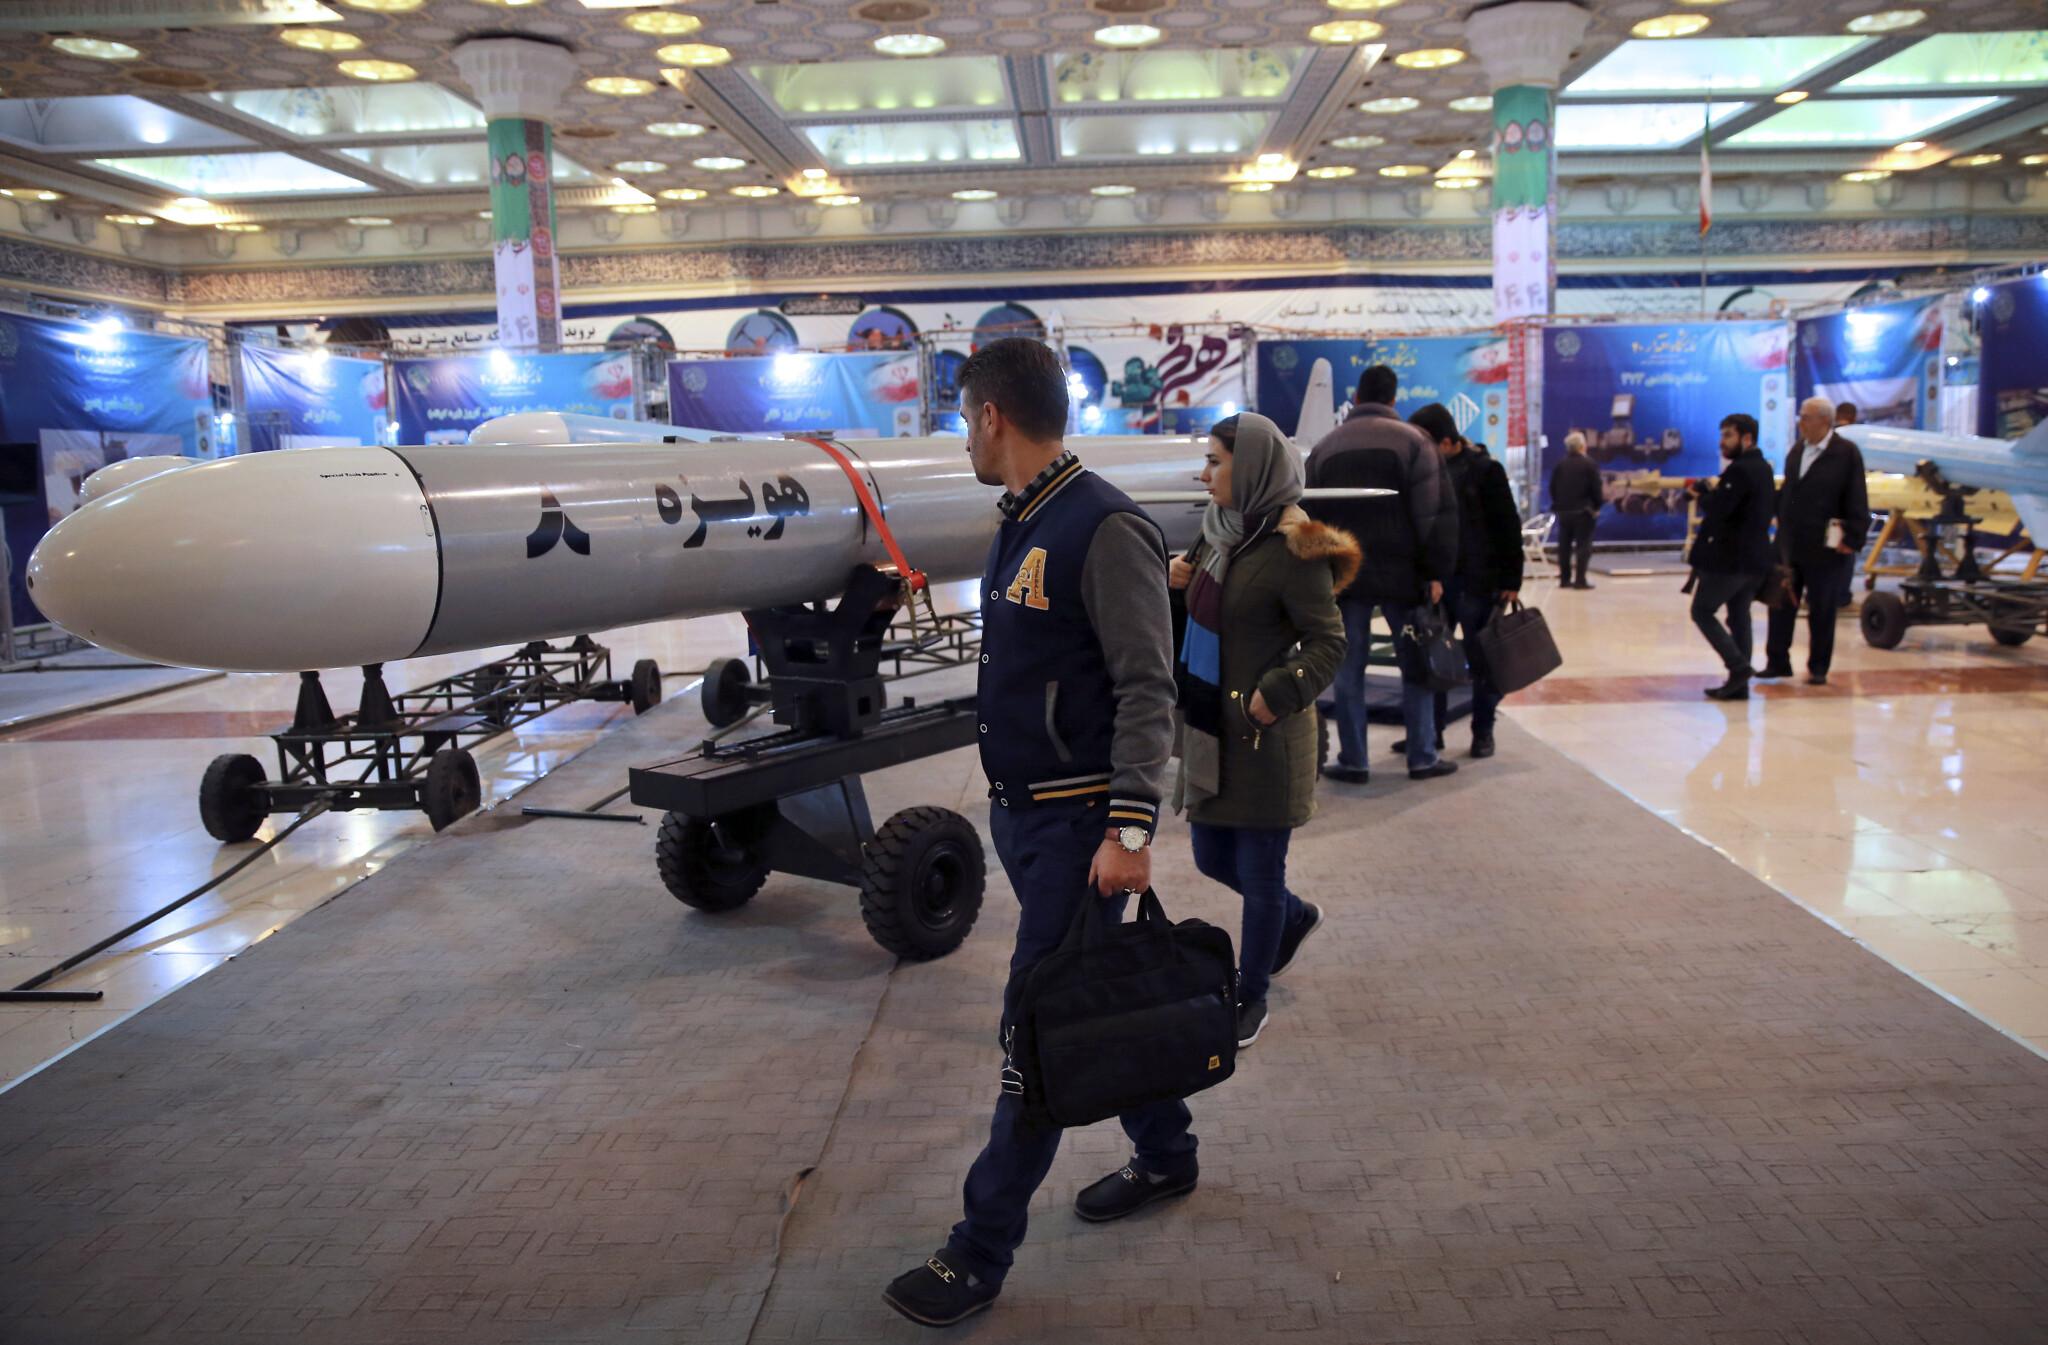 Steven Mnuchin: U.S. Will 'Ramp up More' Sanctions on Iran